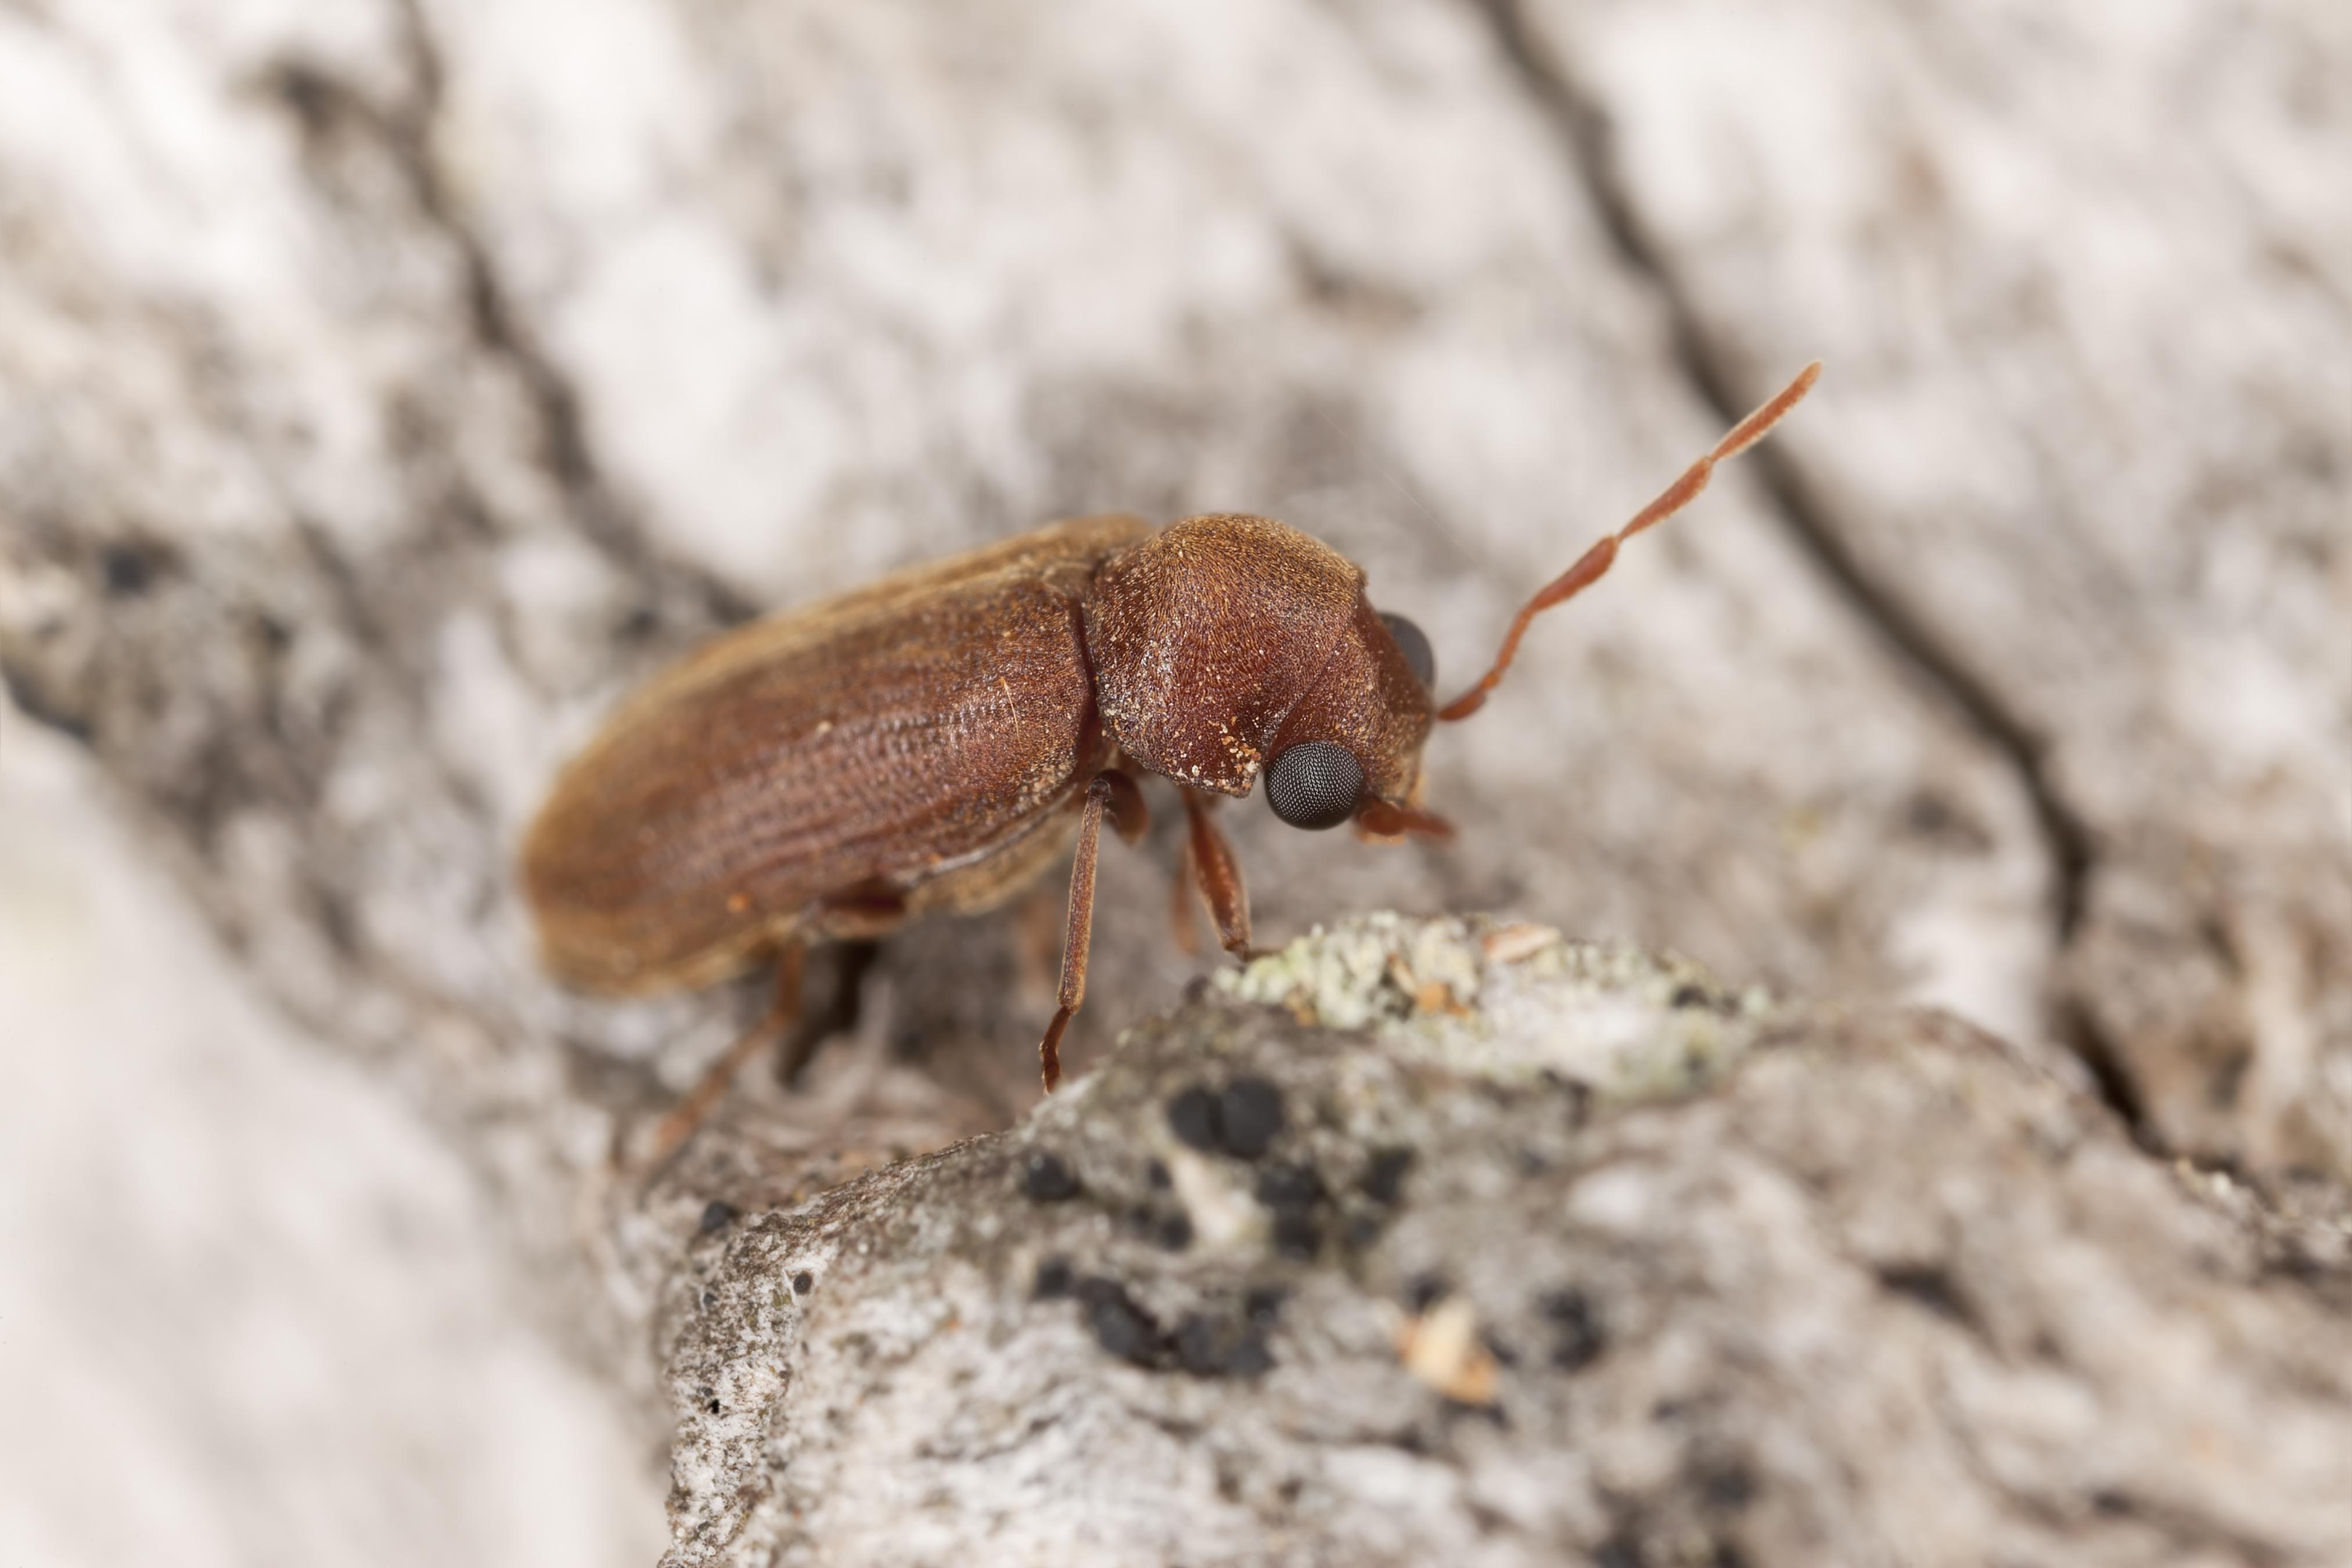 Woodborer, Oligomerus brunneus, extreme close-upting